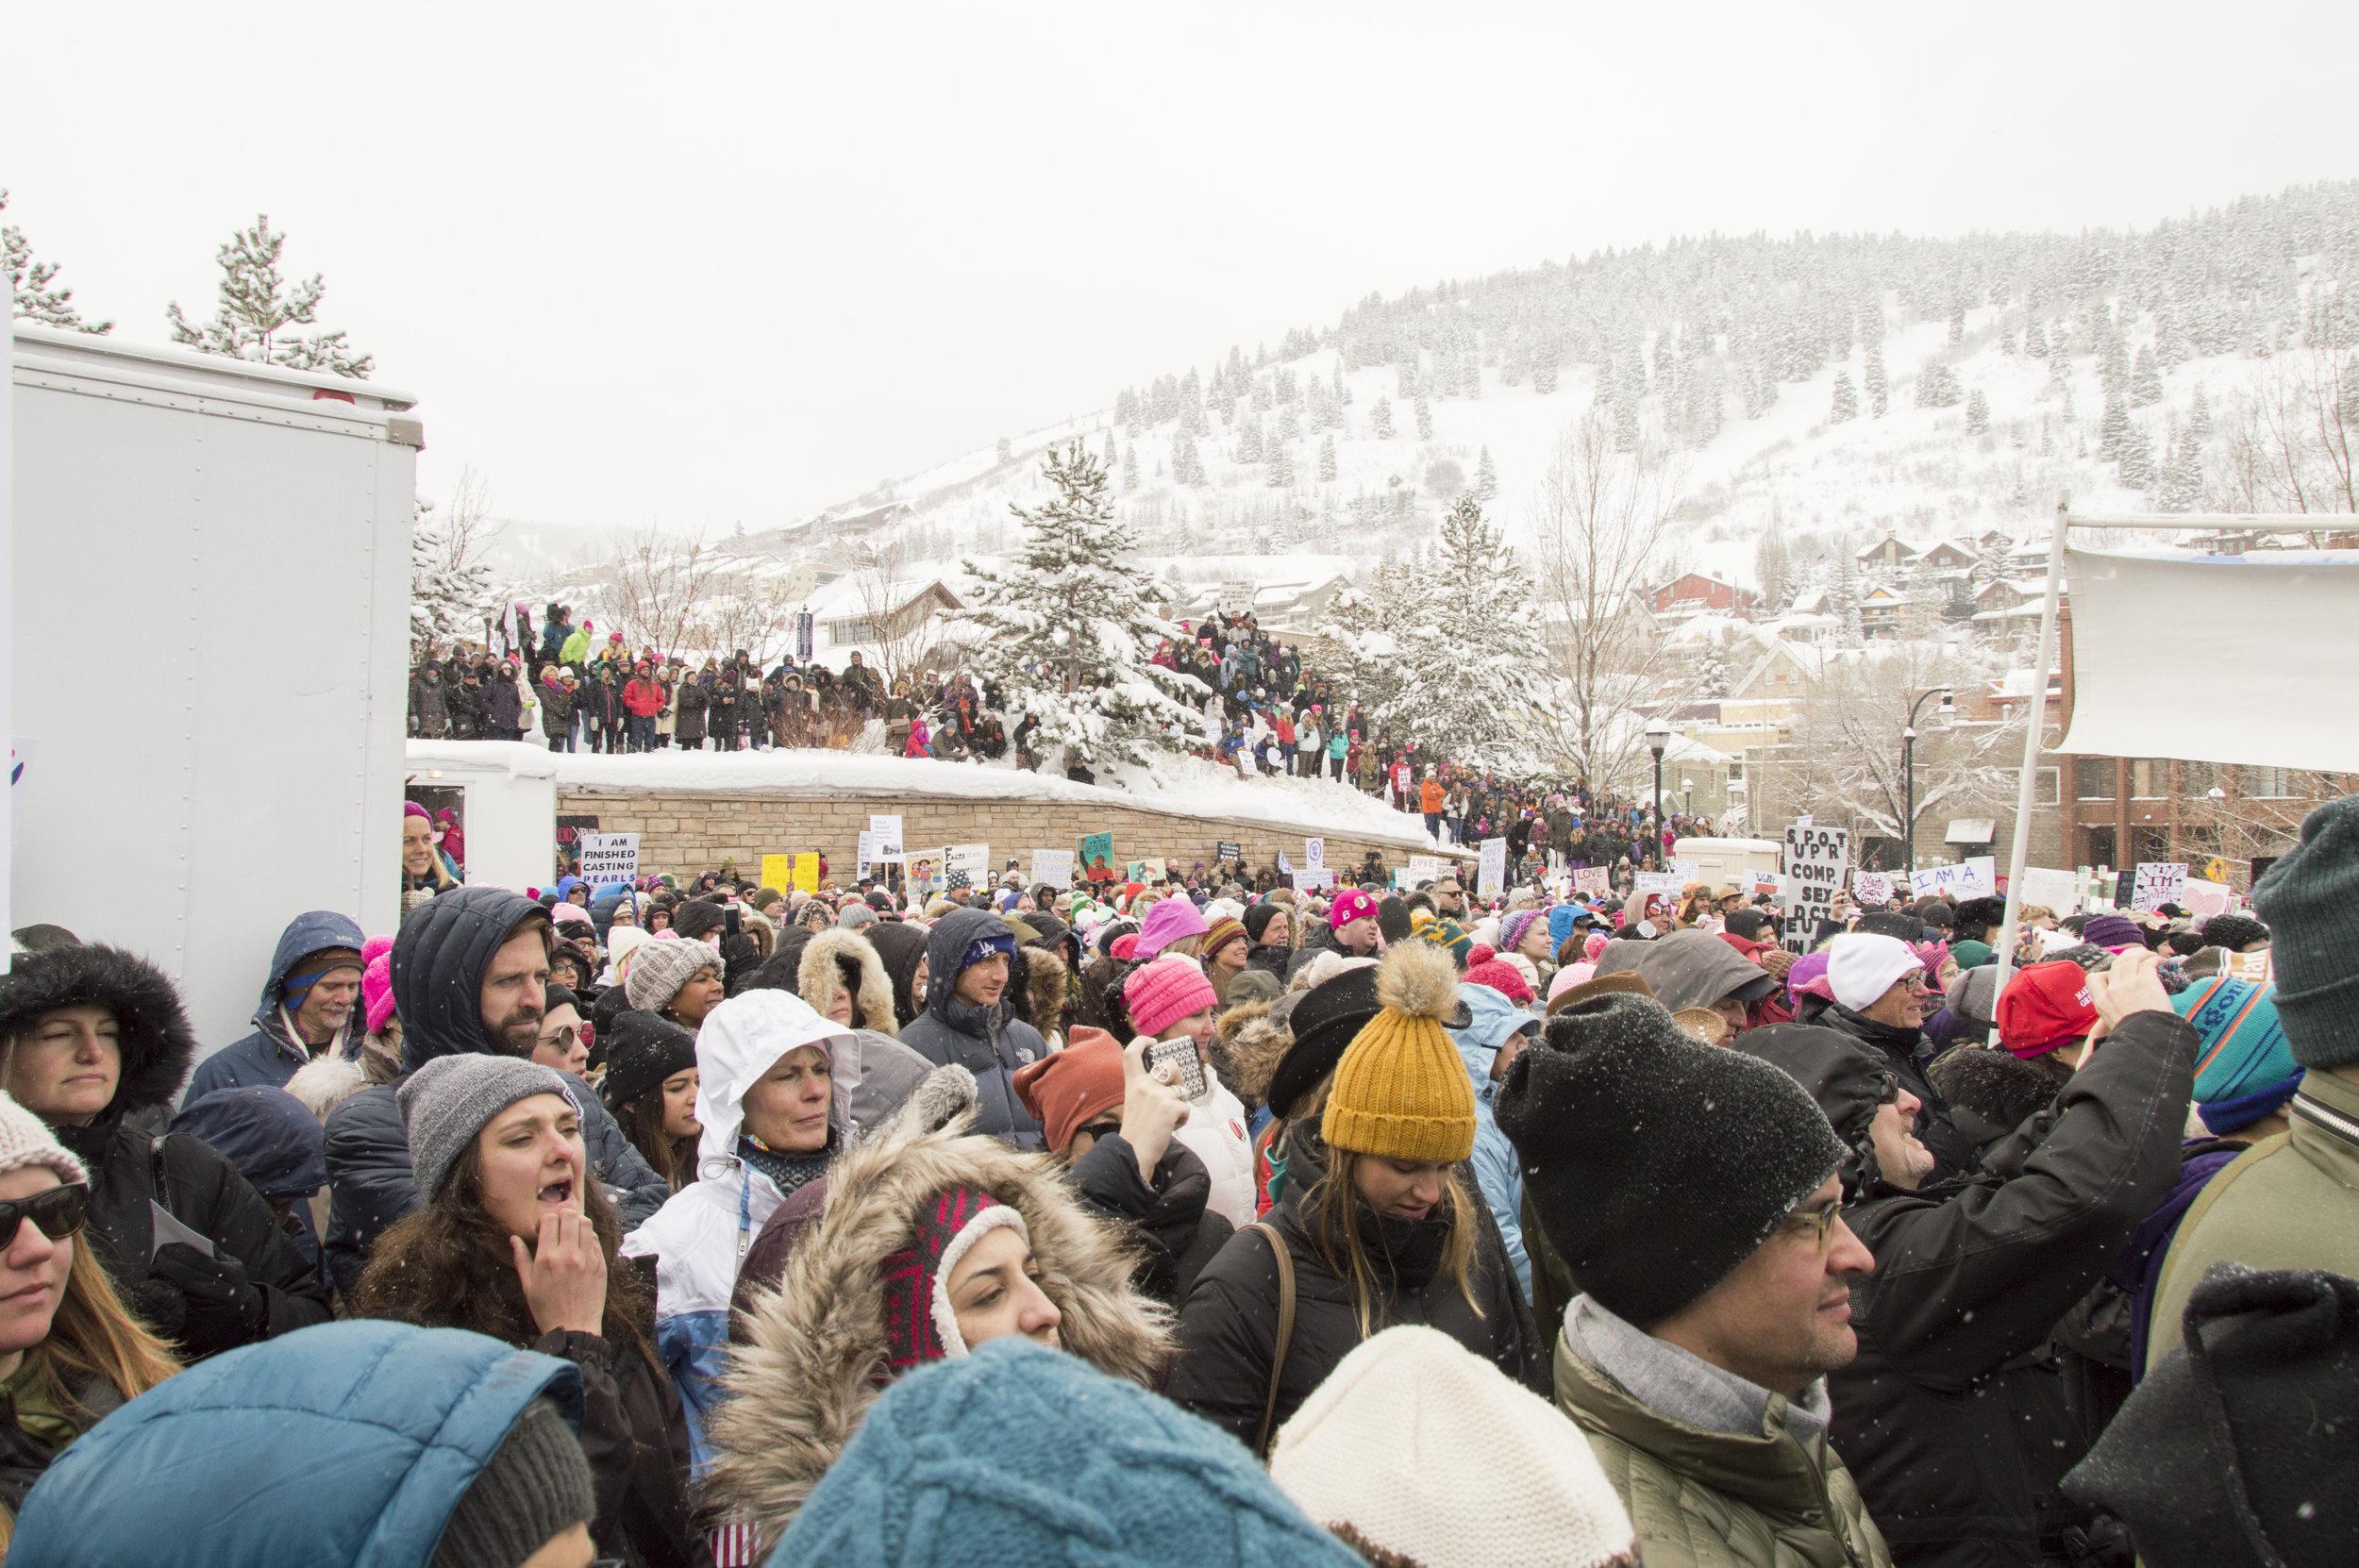 womens march_012117_gigi m kisela022.jpg